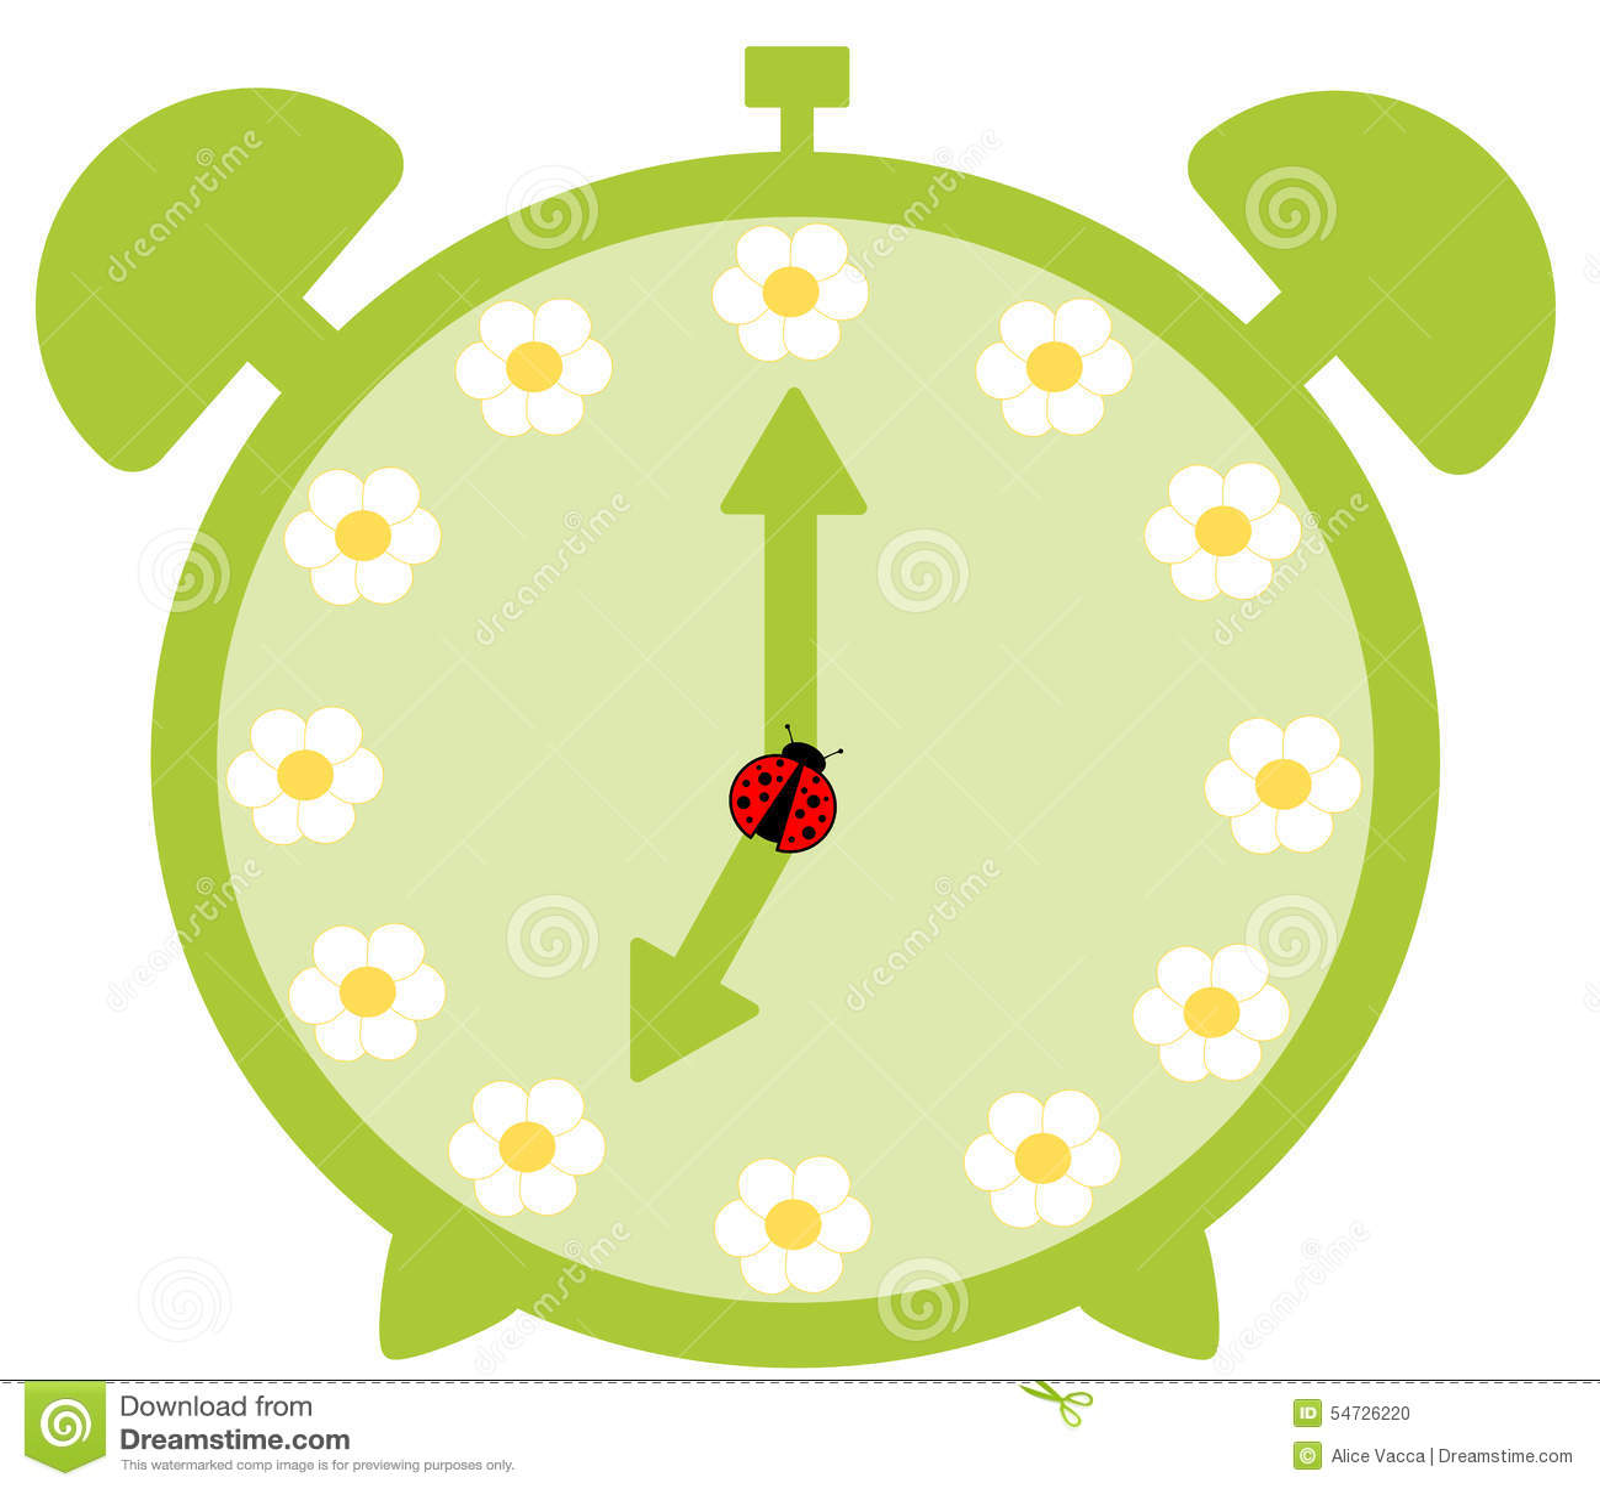 Green cute alarm clock with daisy flower stock illustration green cute alarm clock with daisy flower izmirmasajfo